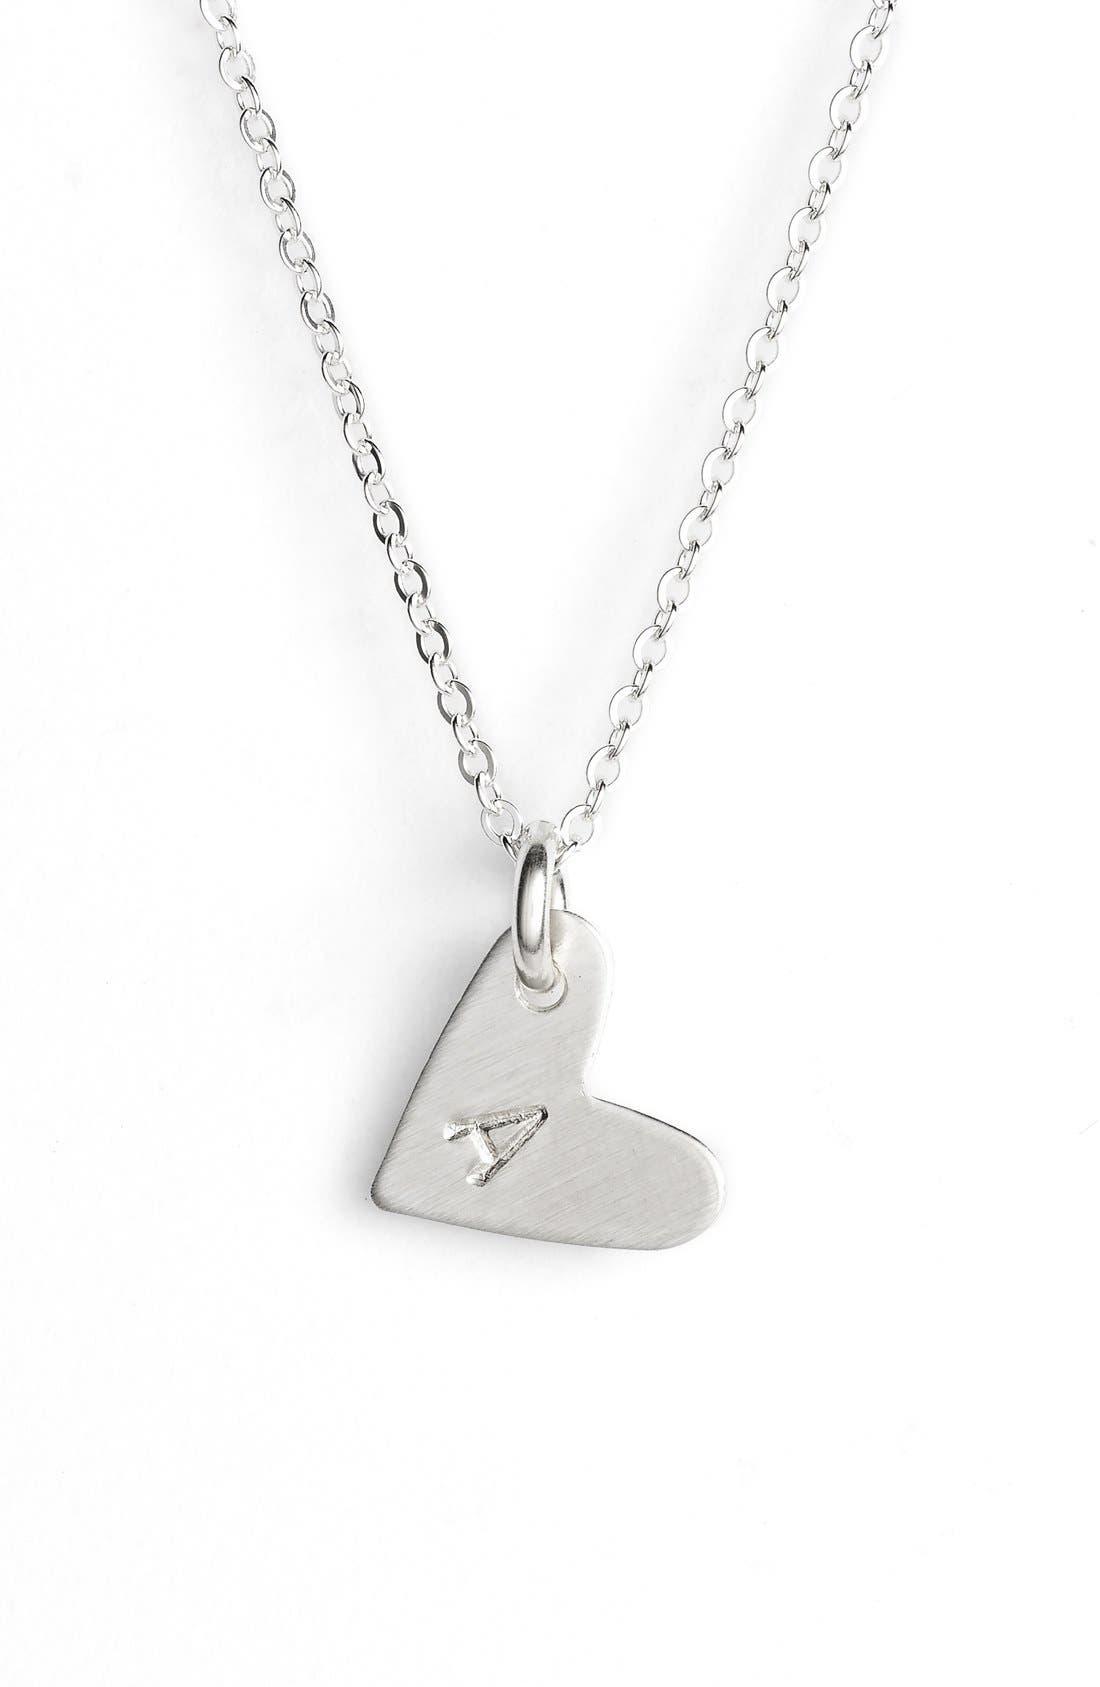 Initial Heart Pendant Necklace,                             Main thumbnail 1, color,                             040